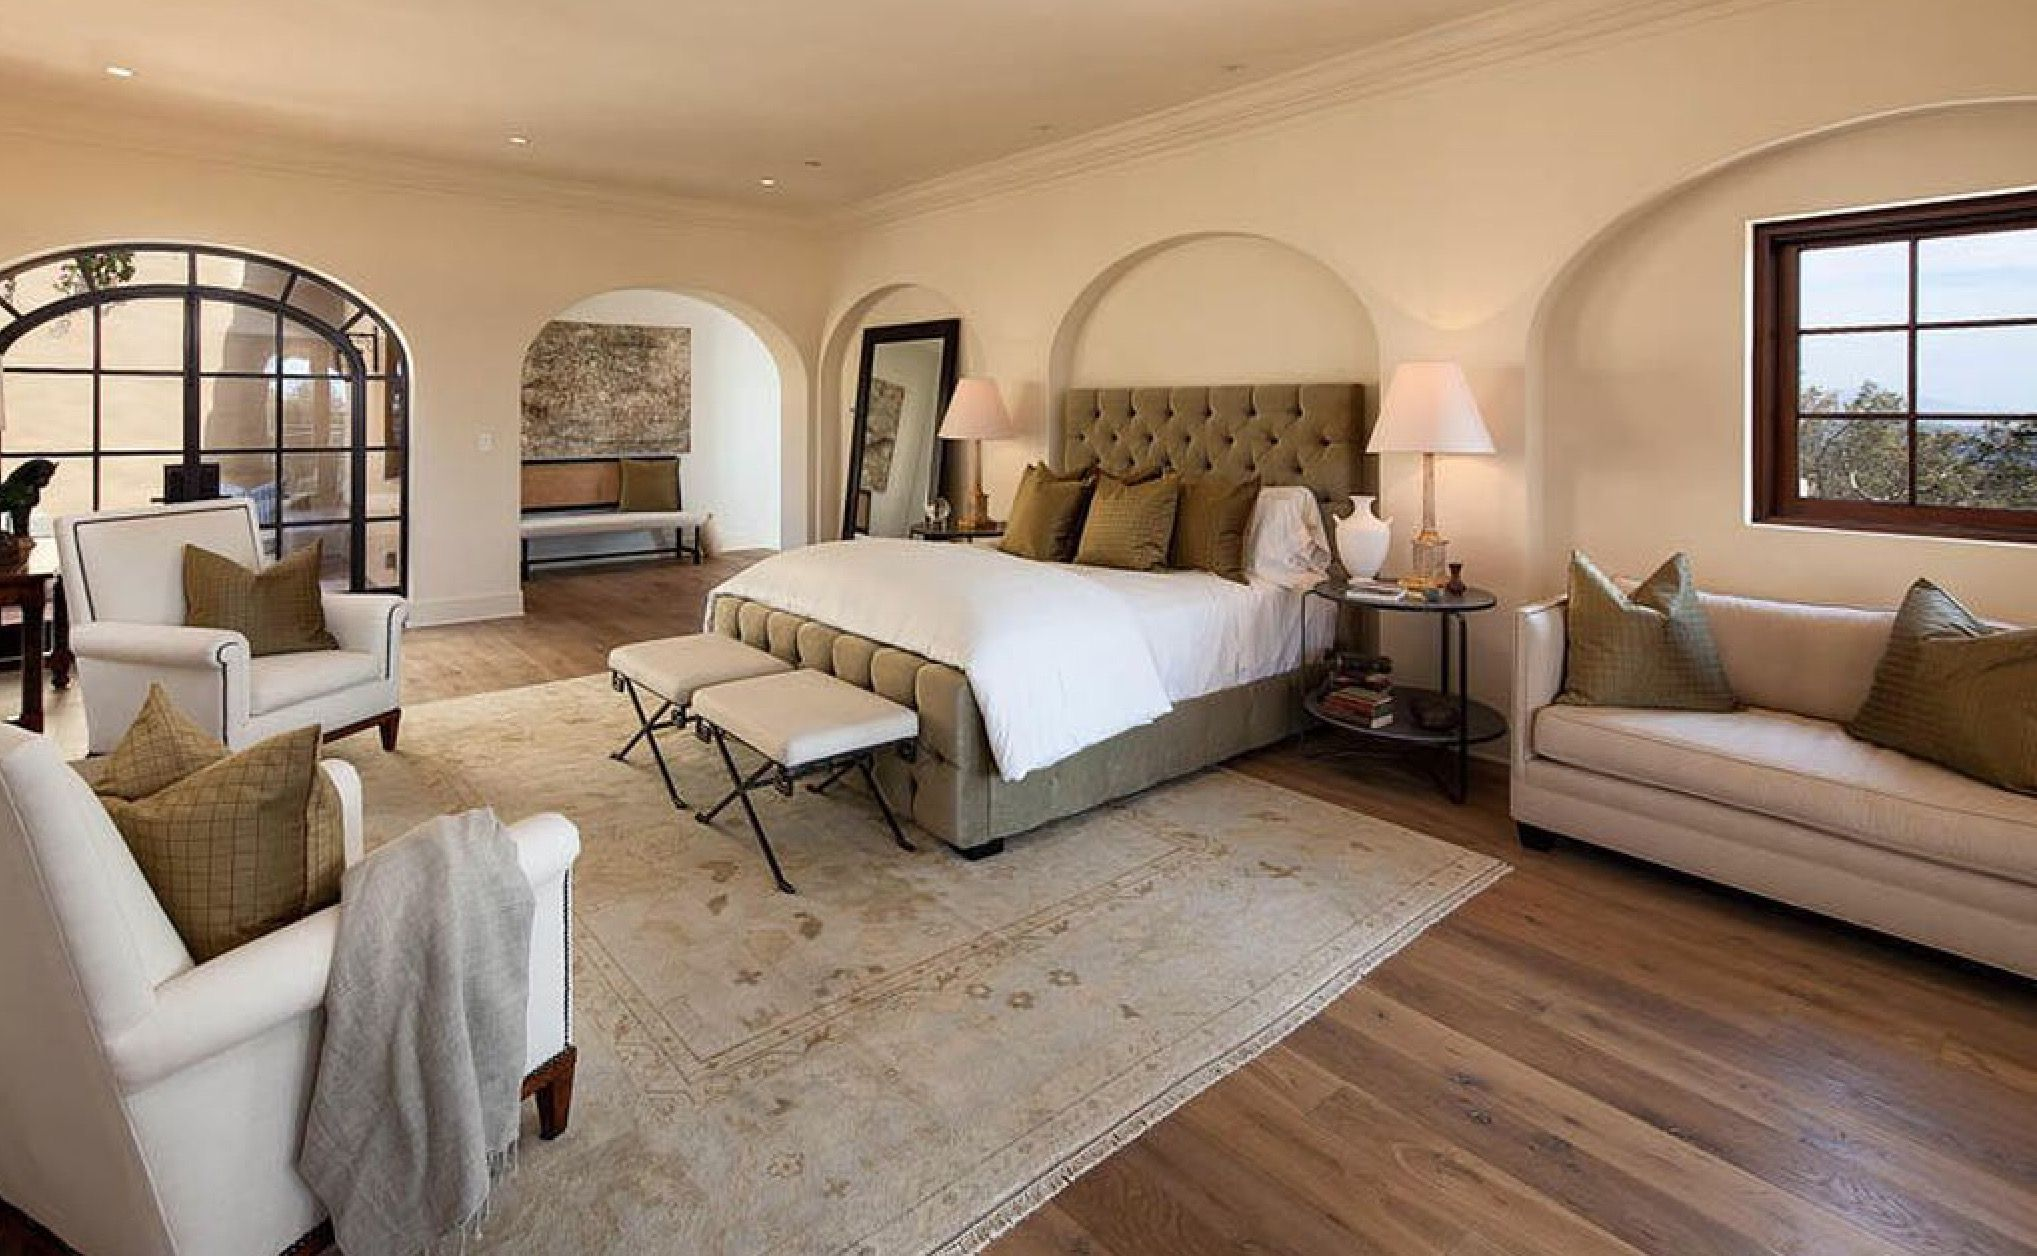 luxurybeddingoceanviews luxury bedding ocean views pinterest rh uk pinterest com